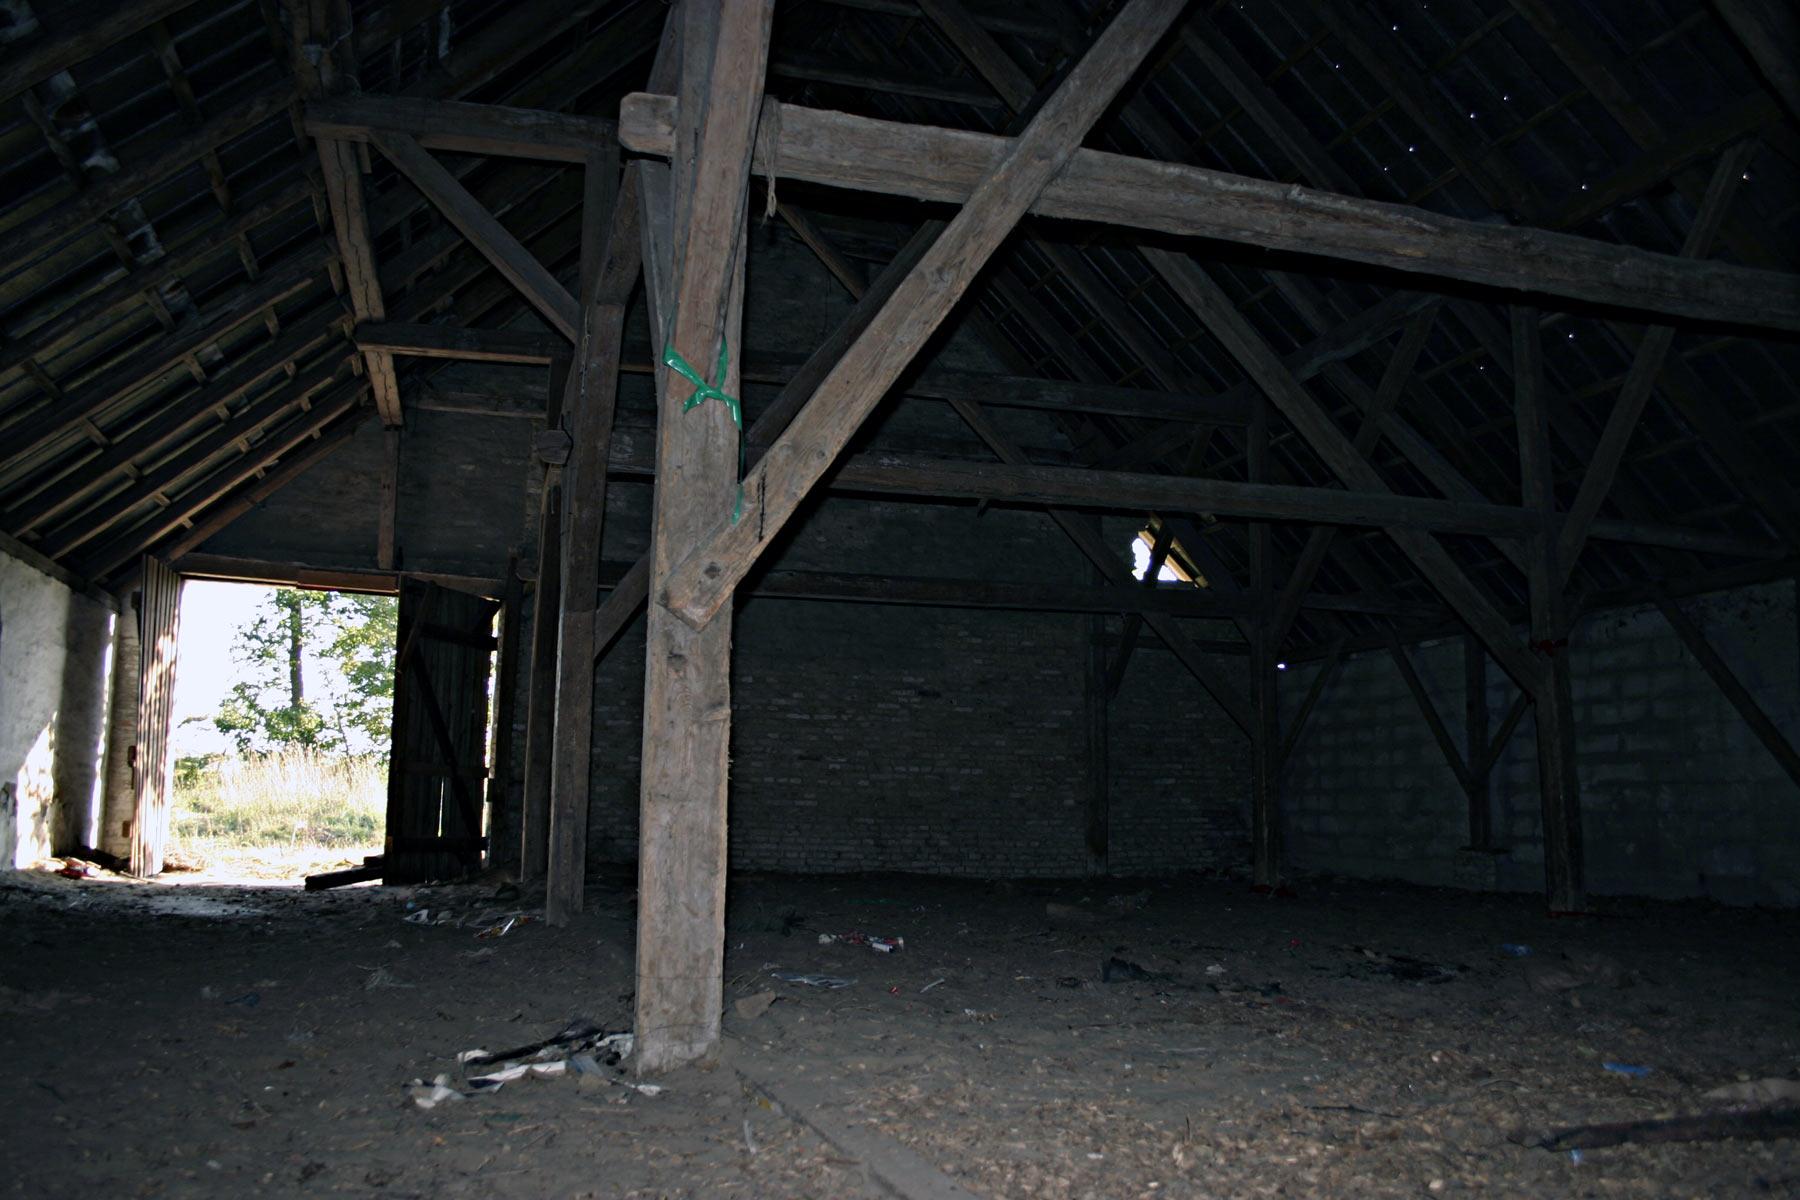 Abandoned building, Abandoned, Broken, Building, Dark, HQ Photo